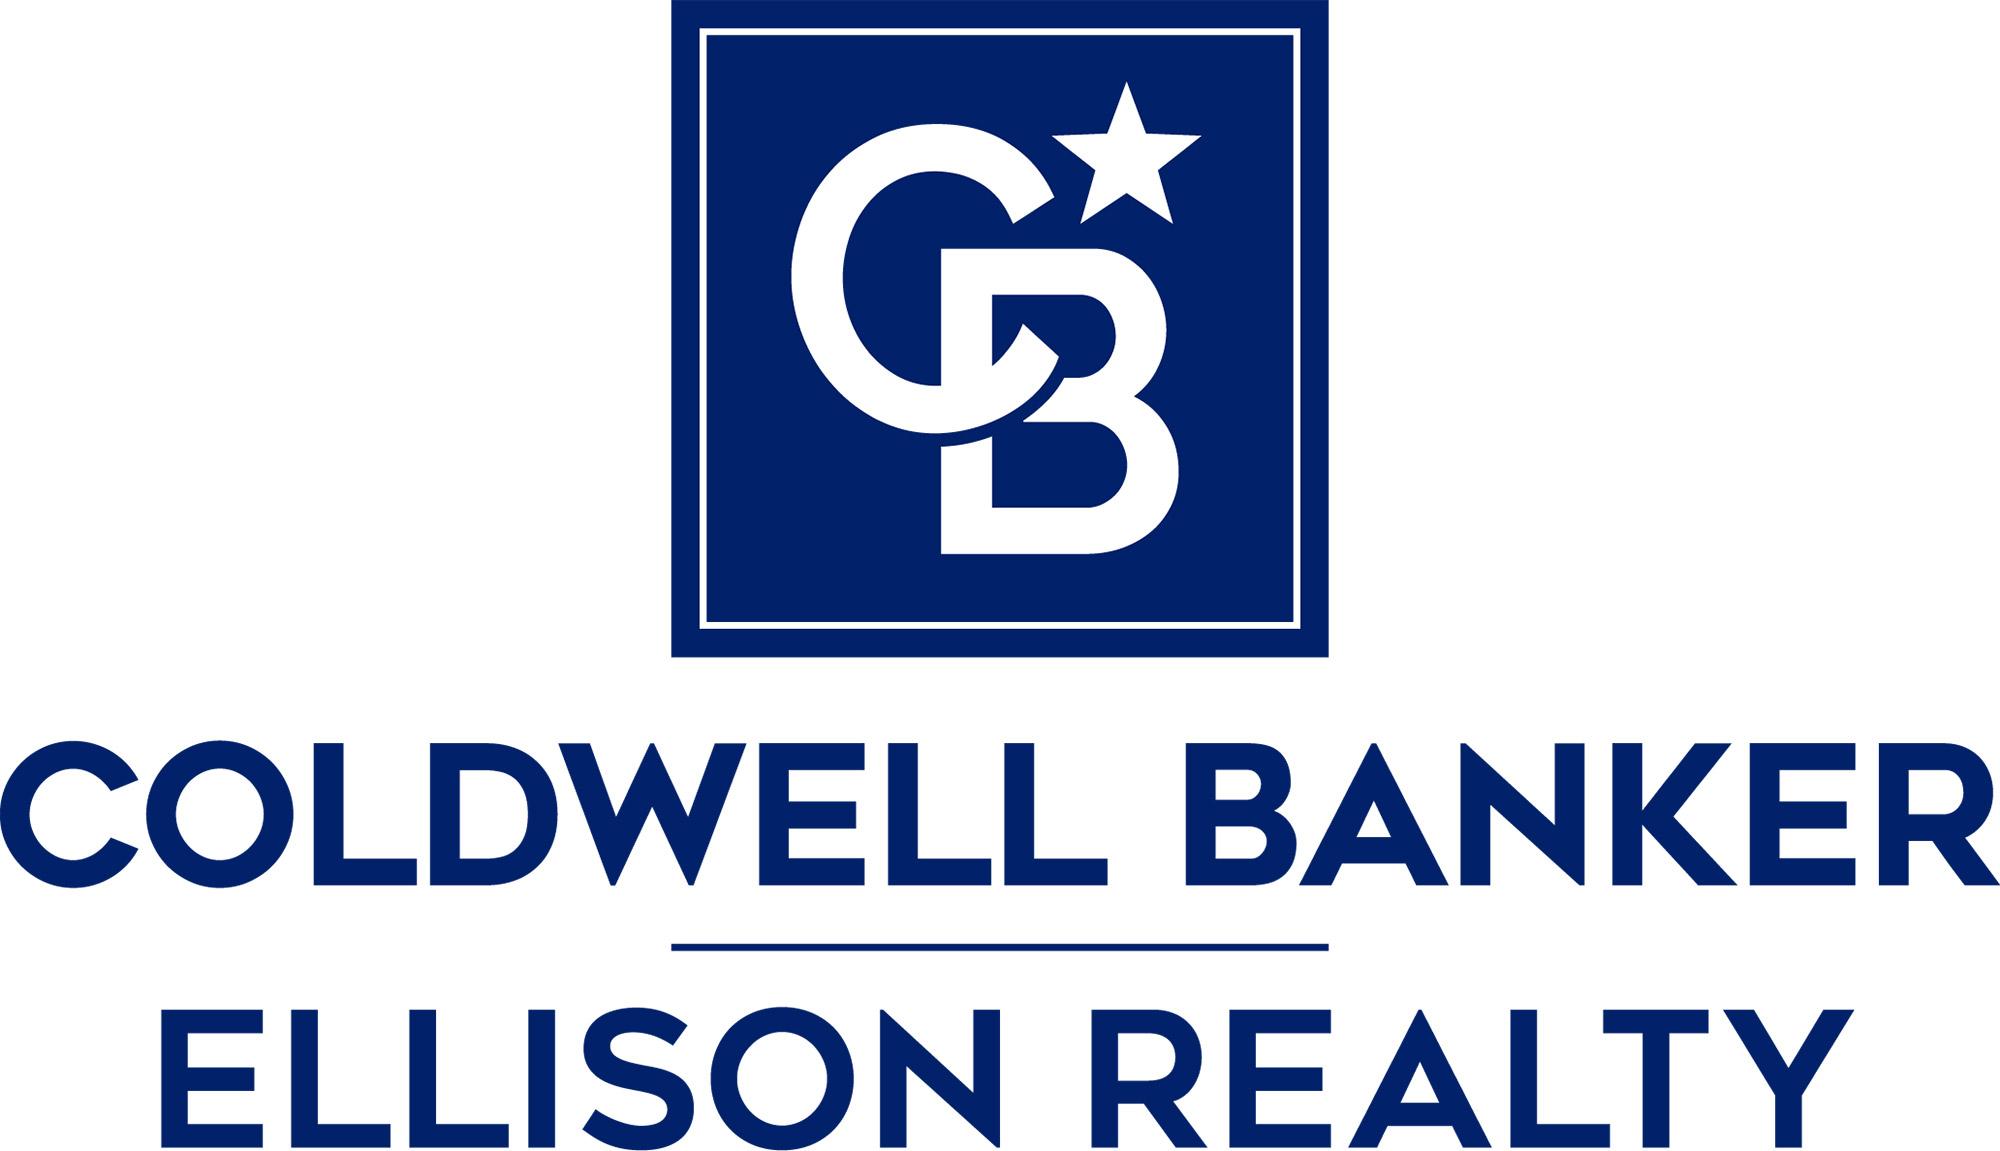 Barbara Merrill - Coldwell Banker Ellison Realty Logo